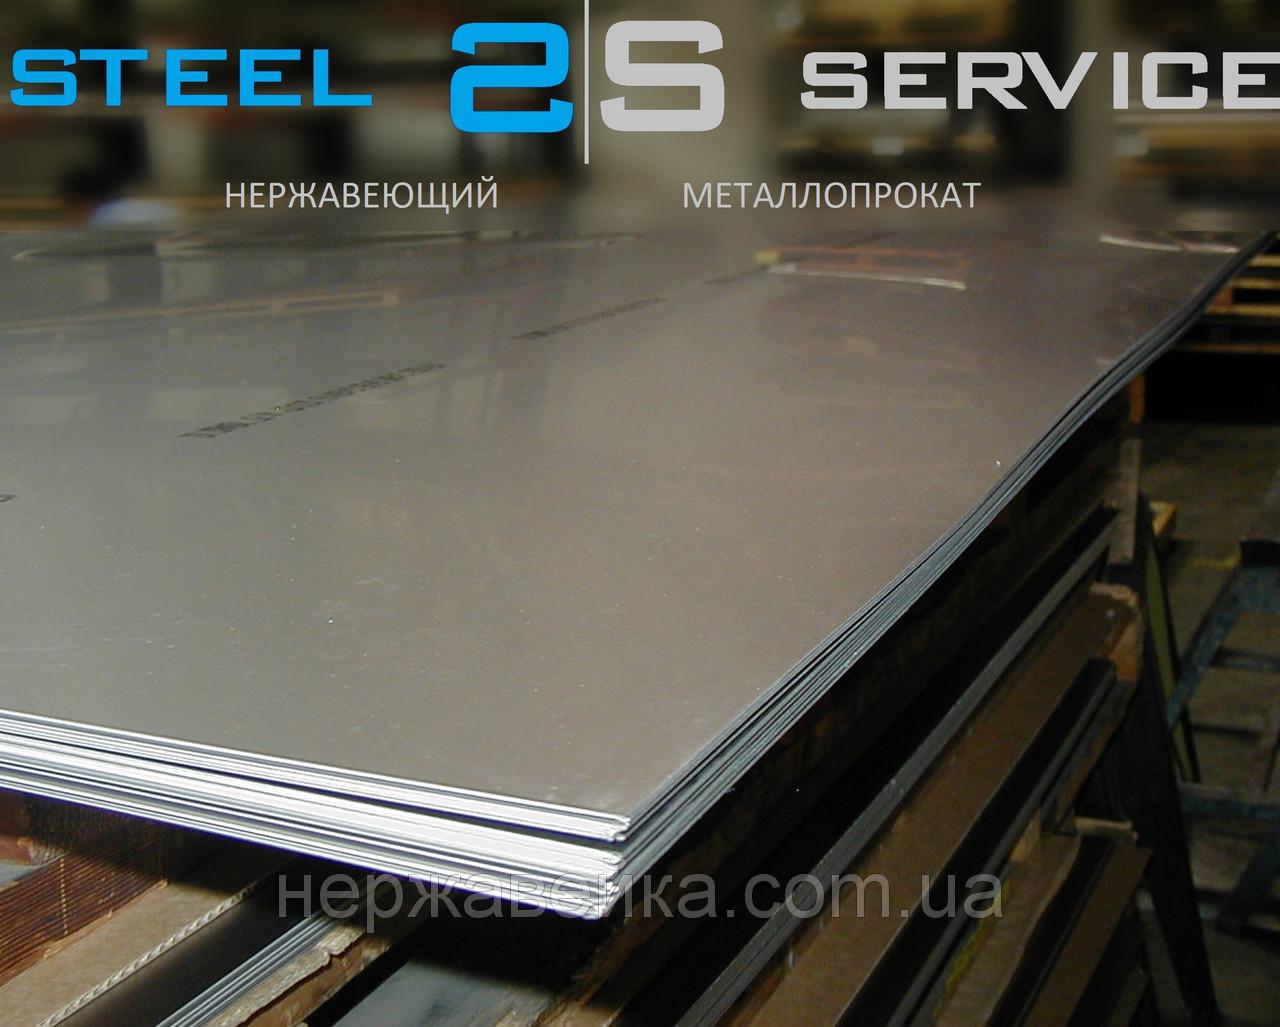 Нержавейка лист 0,5х1250х2500мм  AISI 316L(03Х17Н14М3) 2B - матовый,  кислотостойкий